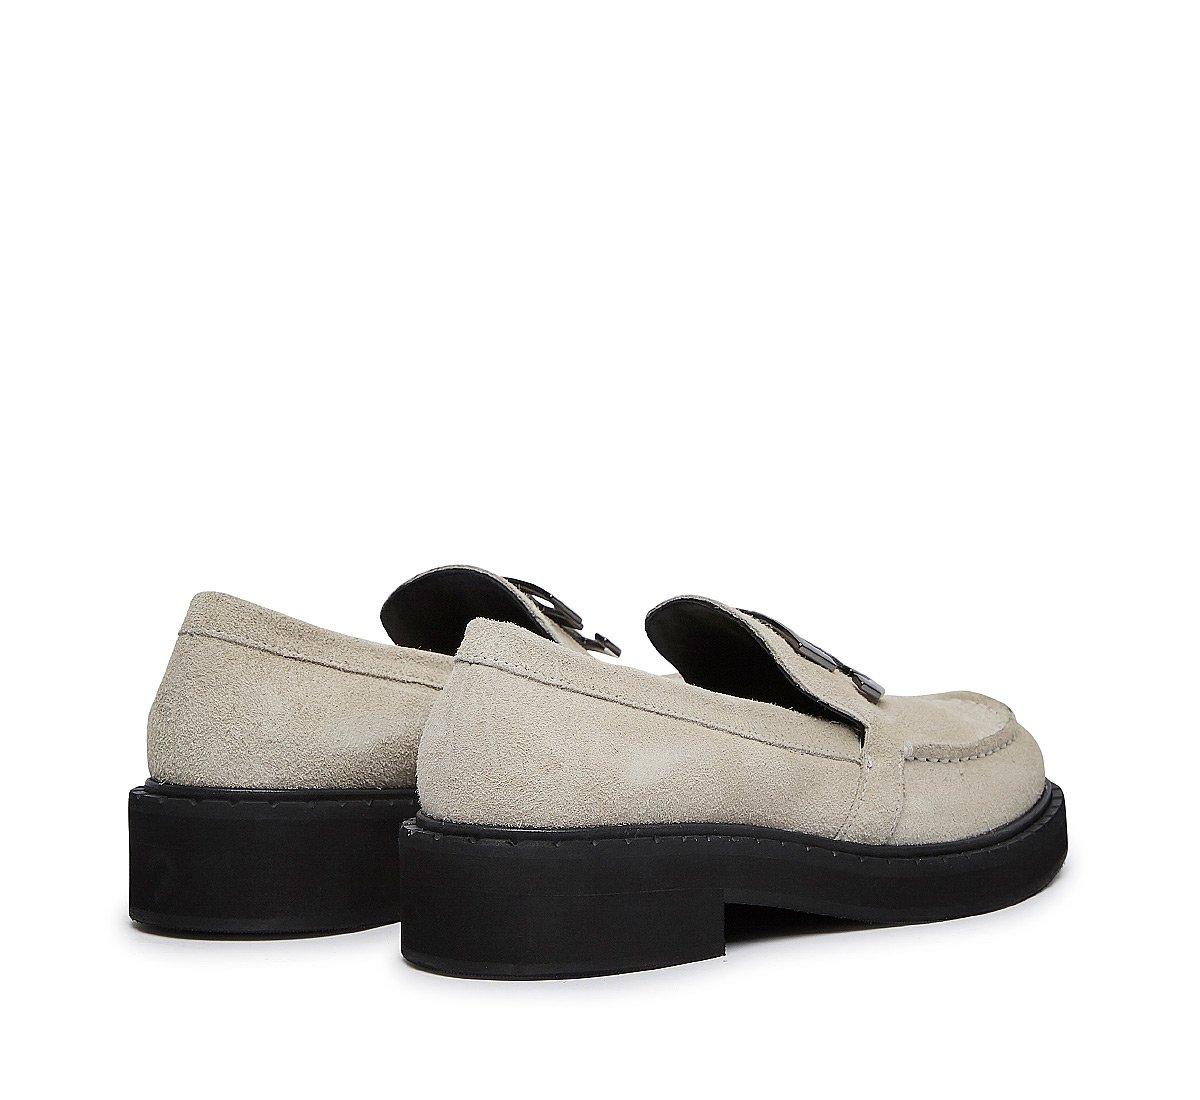 Soft suede moccasins